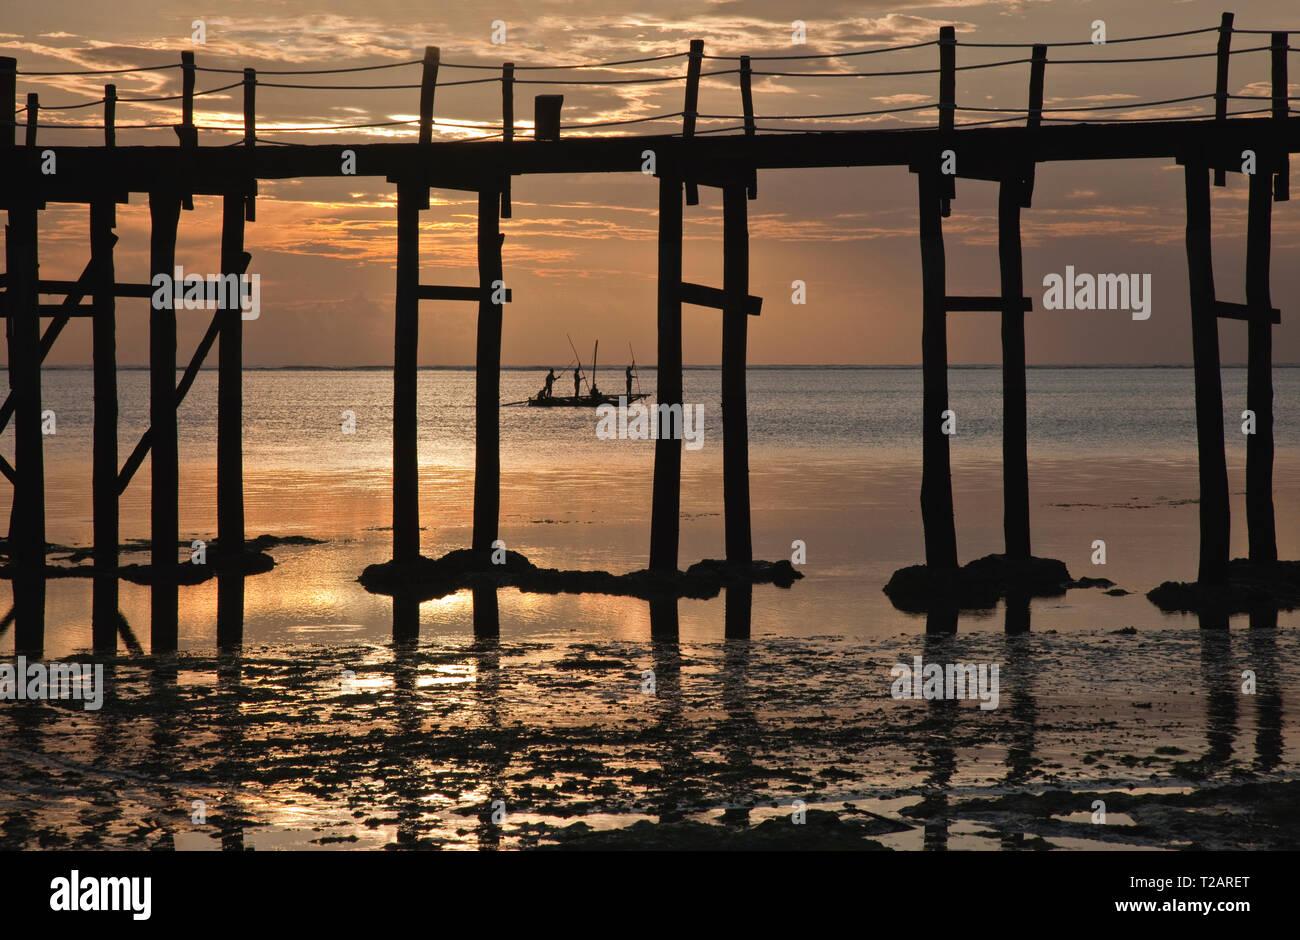 Tanzanian Fishermen returning sceneryhome at Dawn - Stock Image